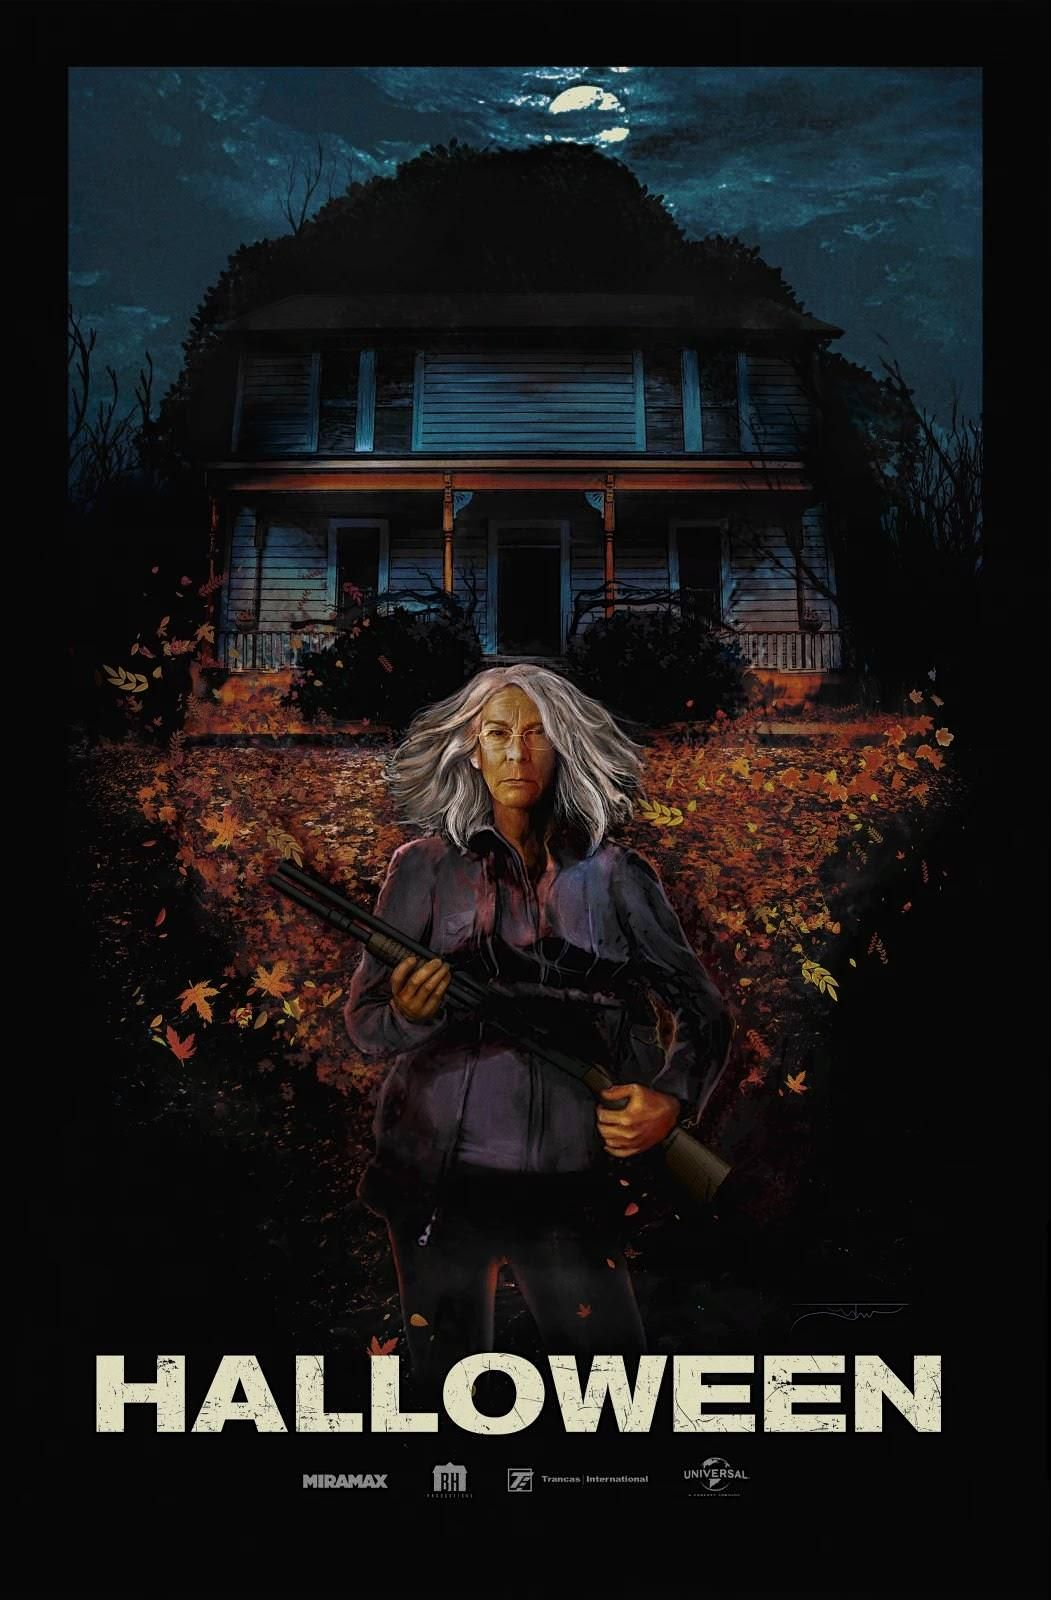 Halloween 2018 poster Michael myers halloween, Halloween